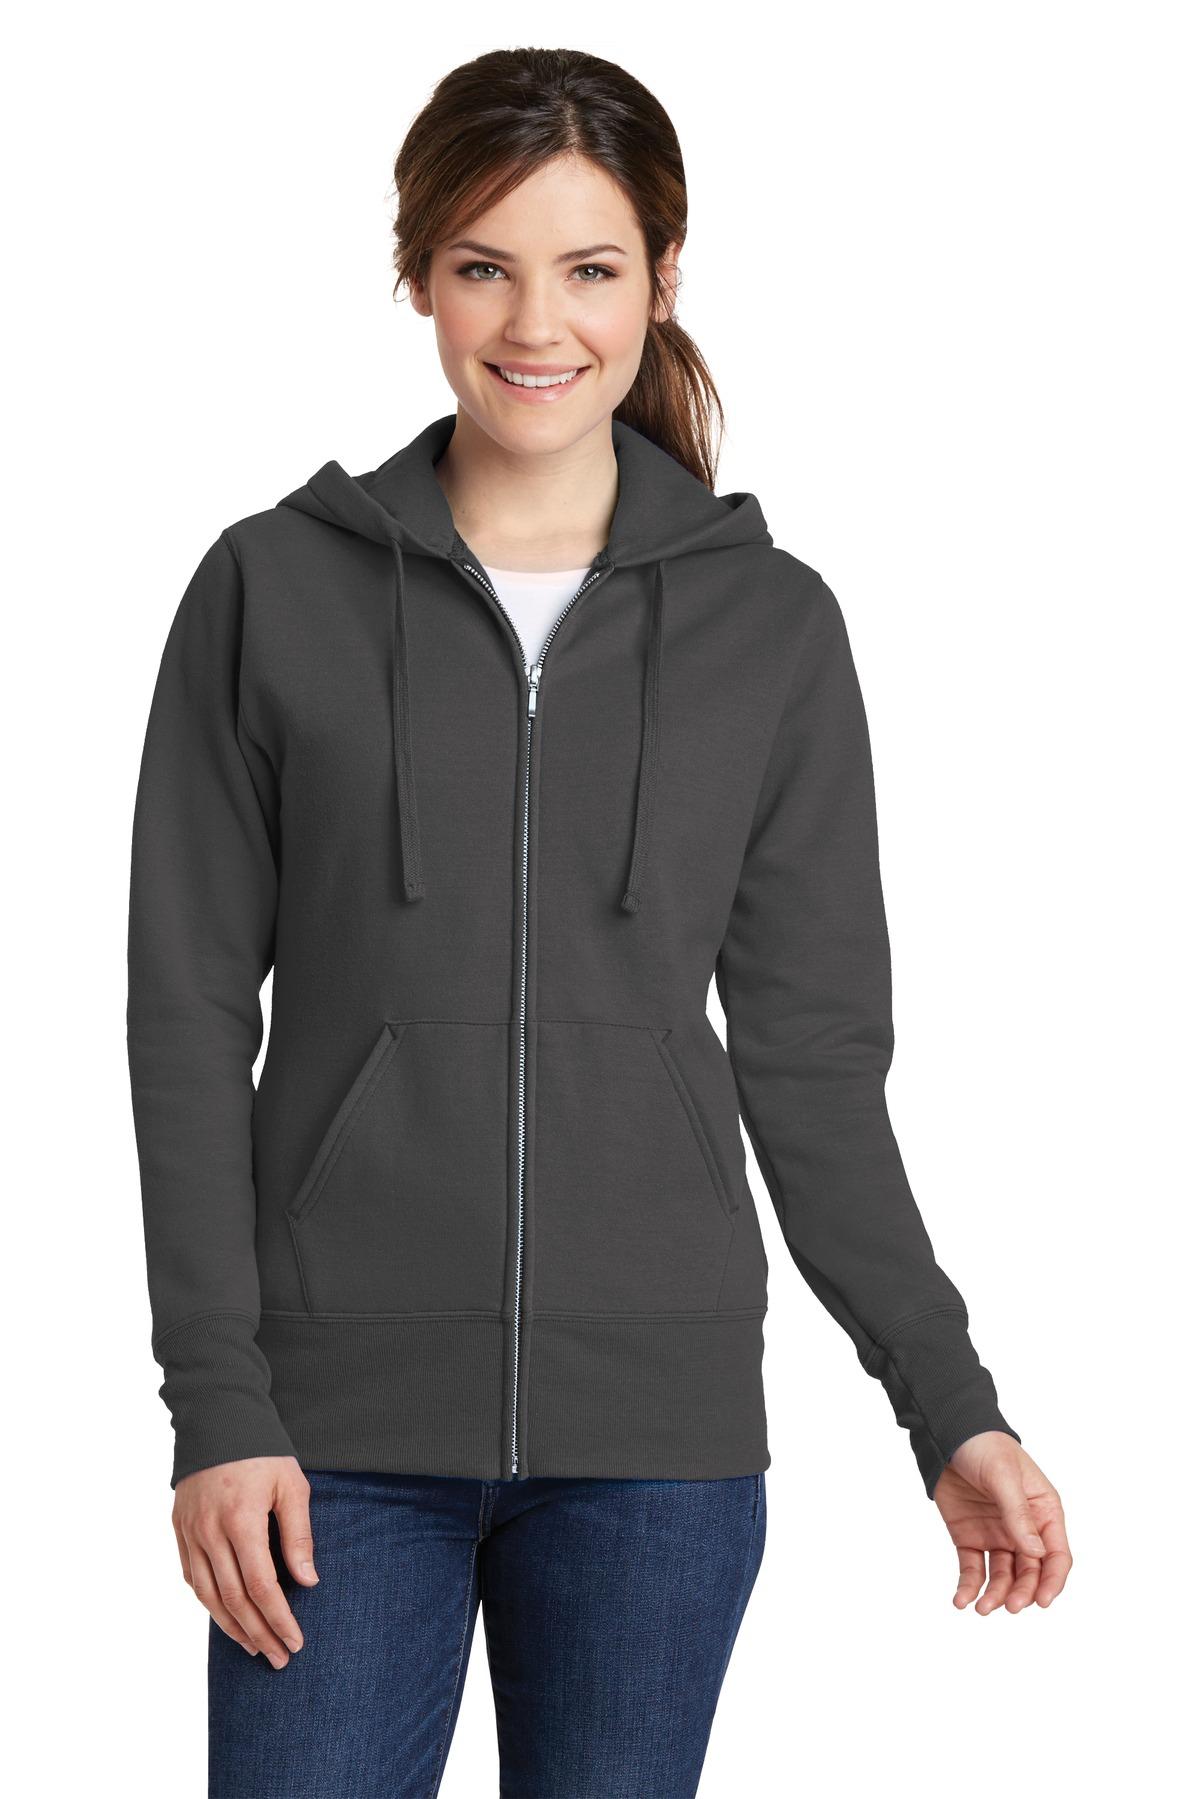 Port & Company  LPC78ZH - Ladies Classic Full-Zip Hooded Sweatshirt